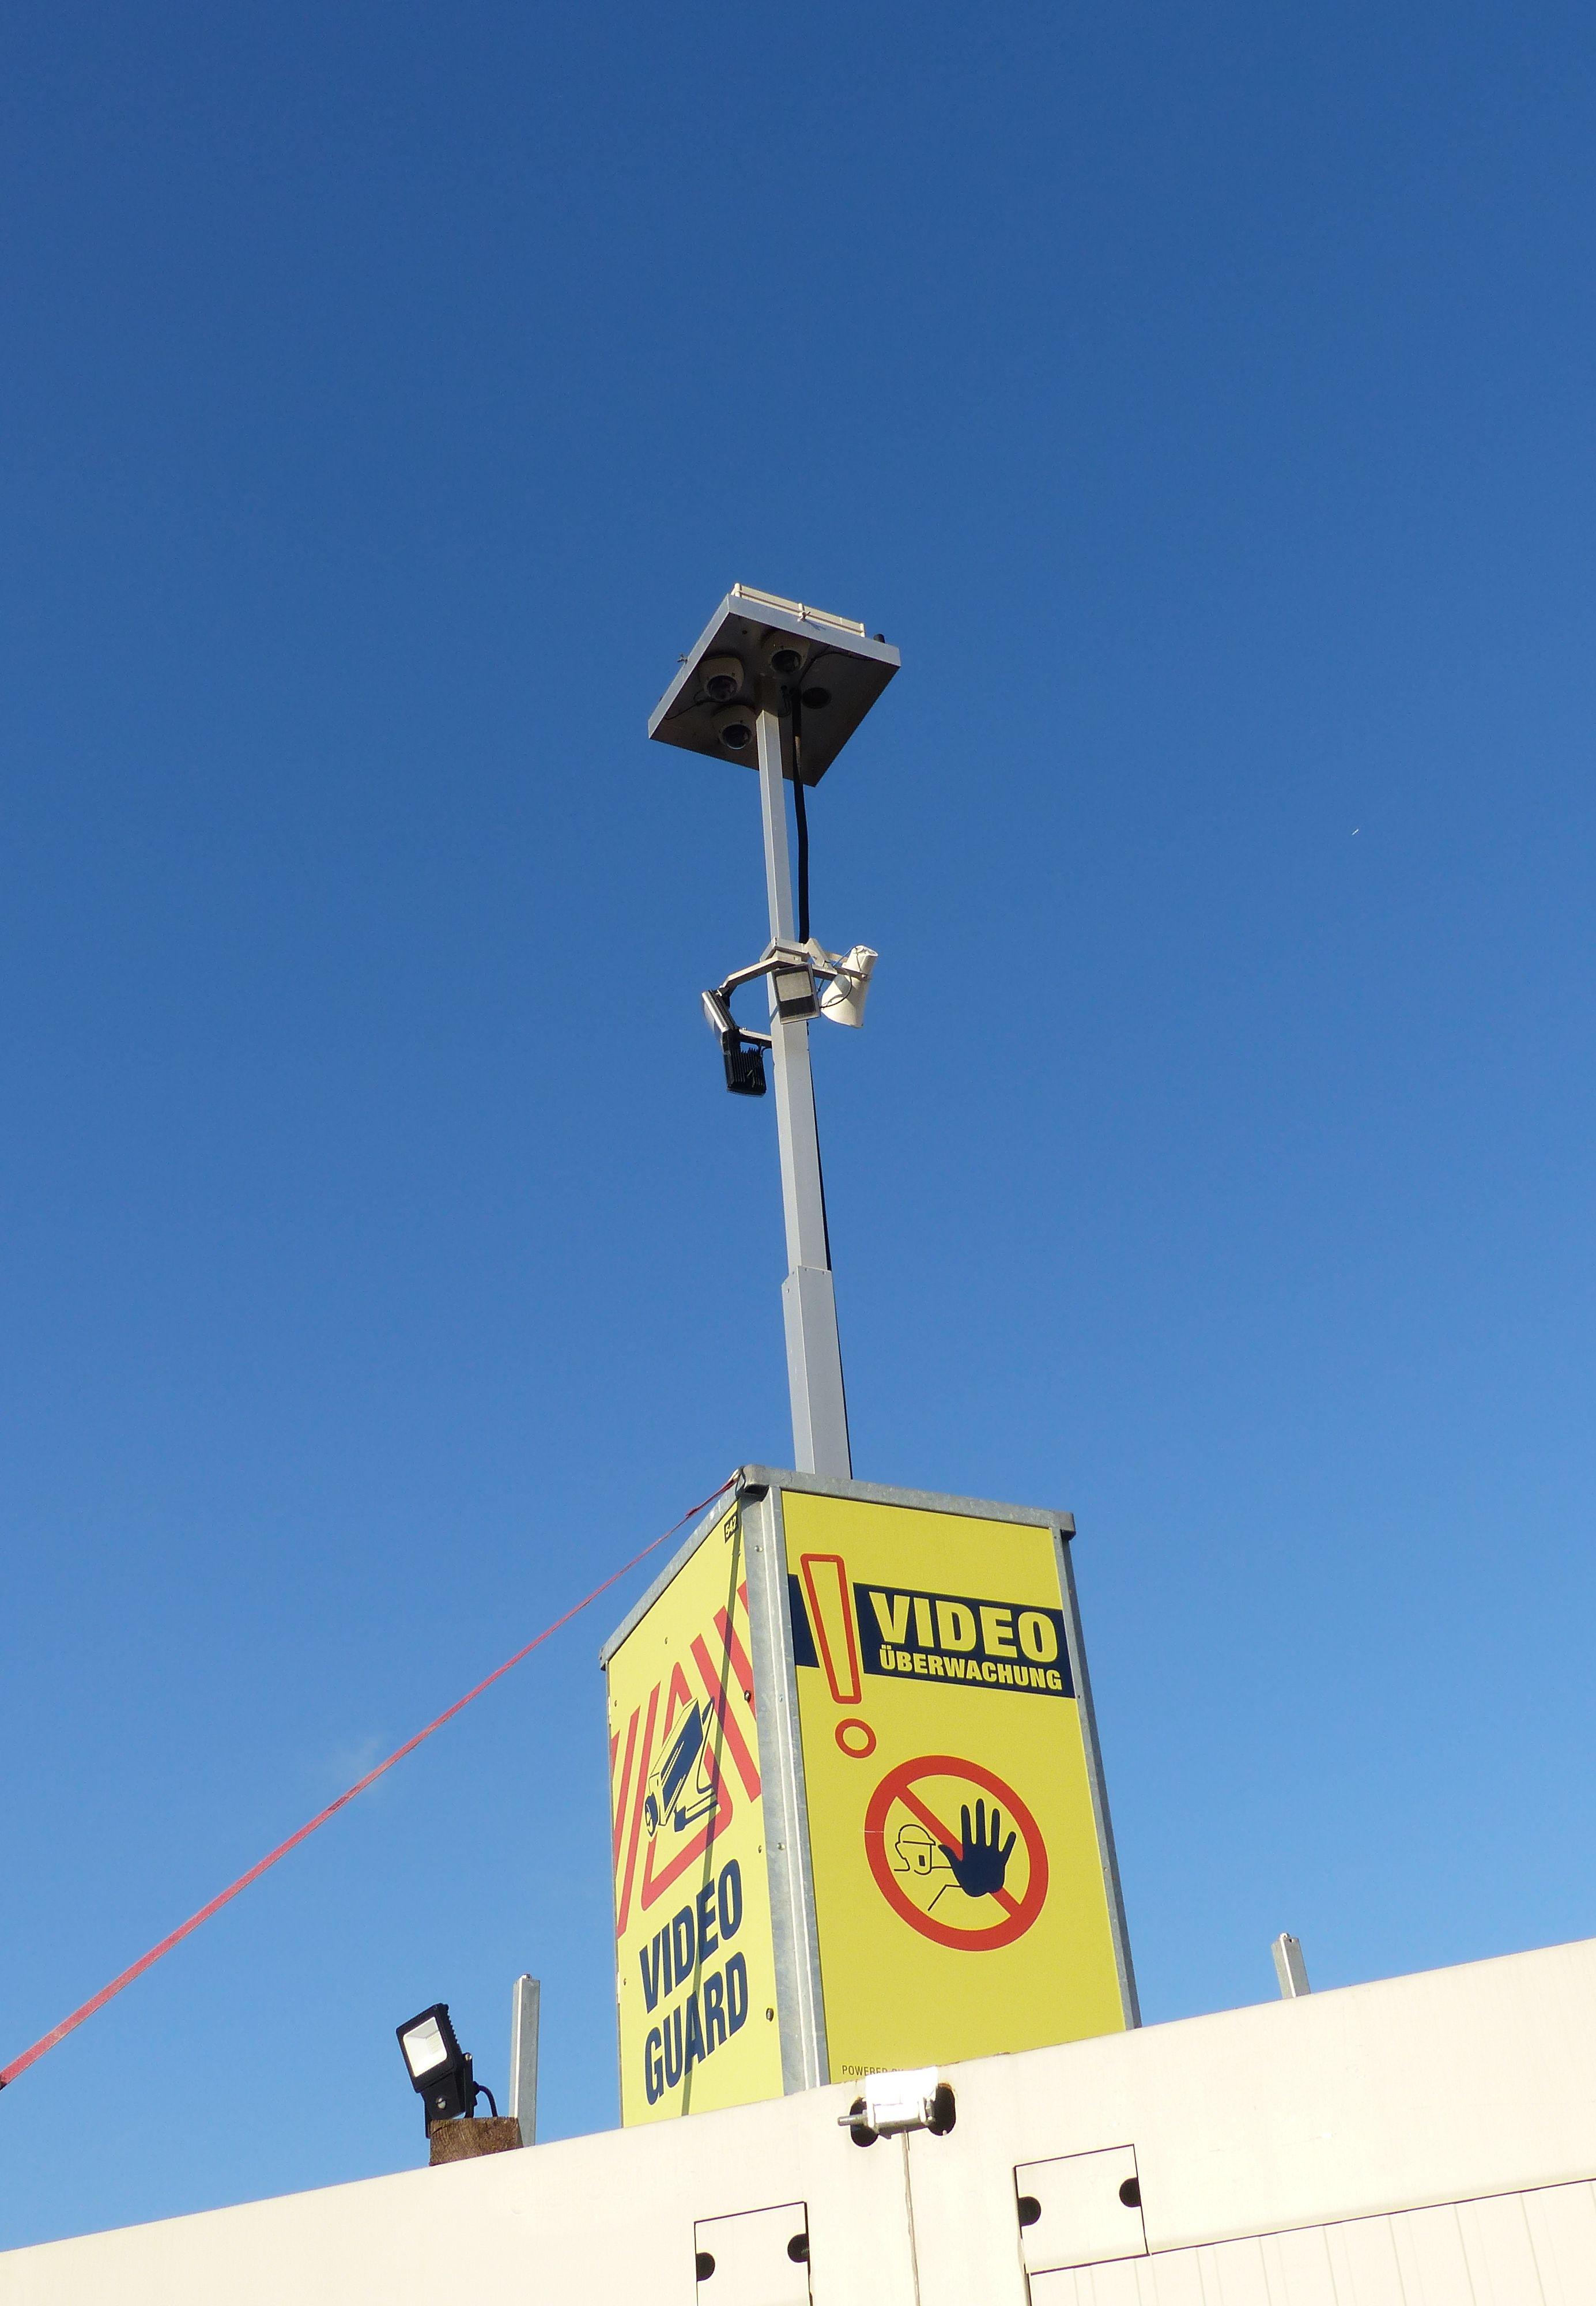 Videoguard24-Turm